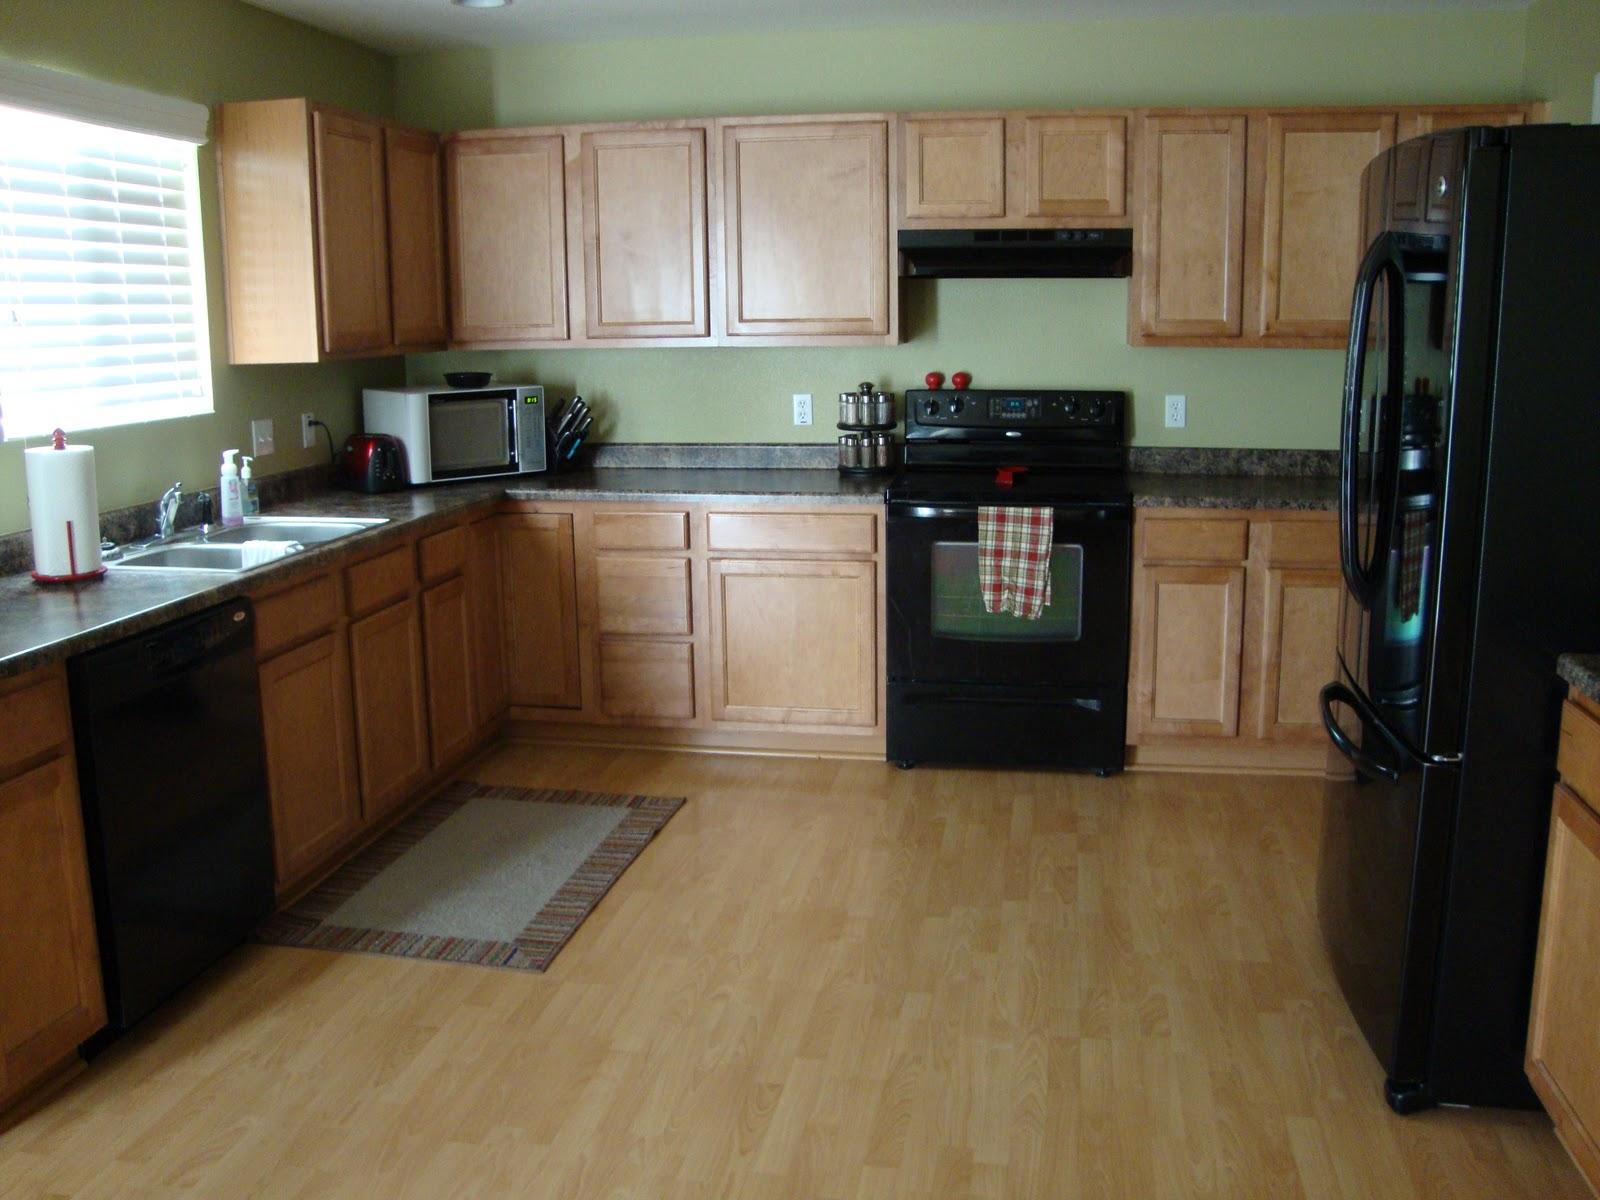 Decoupage Kitchen Cabinets Decoupaged Backsplash Tutorial Just Between Friends